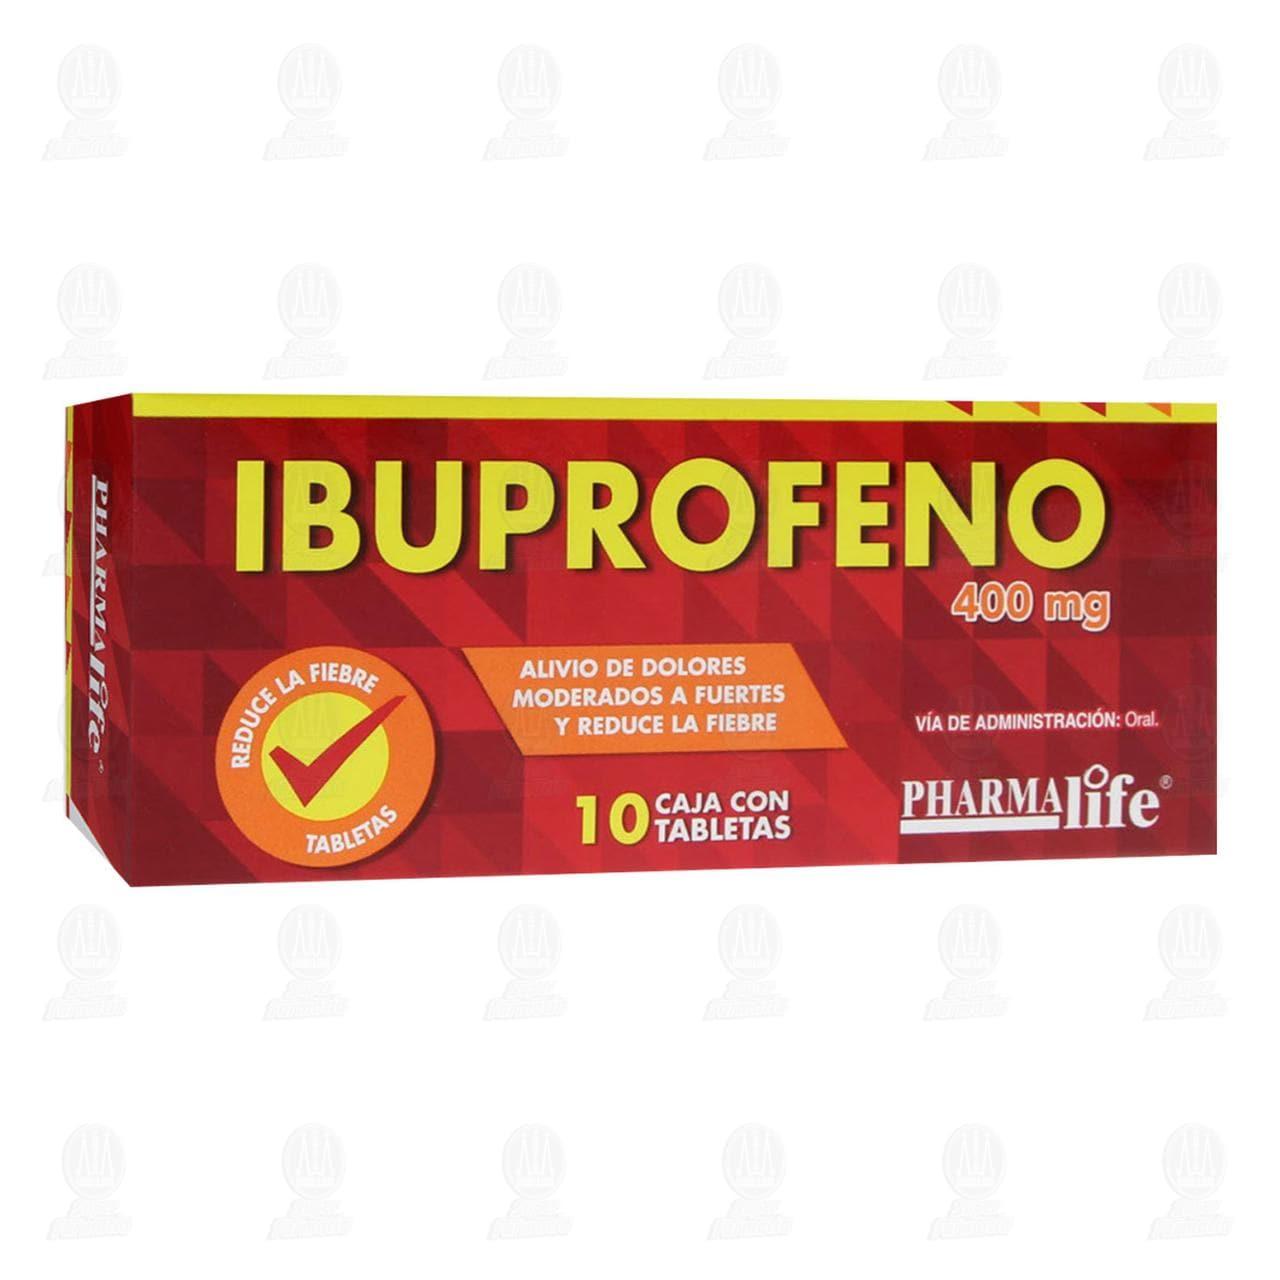 Comprar Ibuprofeno 400mg 10 Tabletas Pharmalife en Farmacias Guadalajara